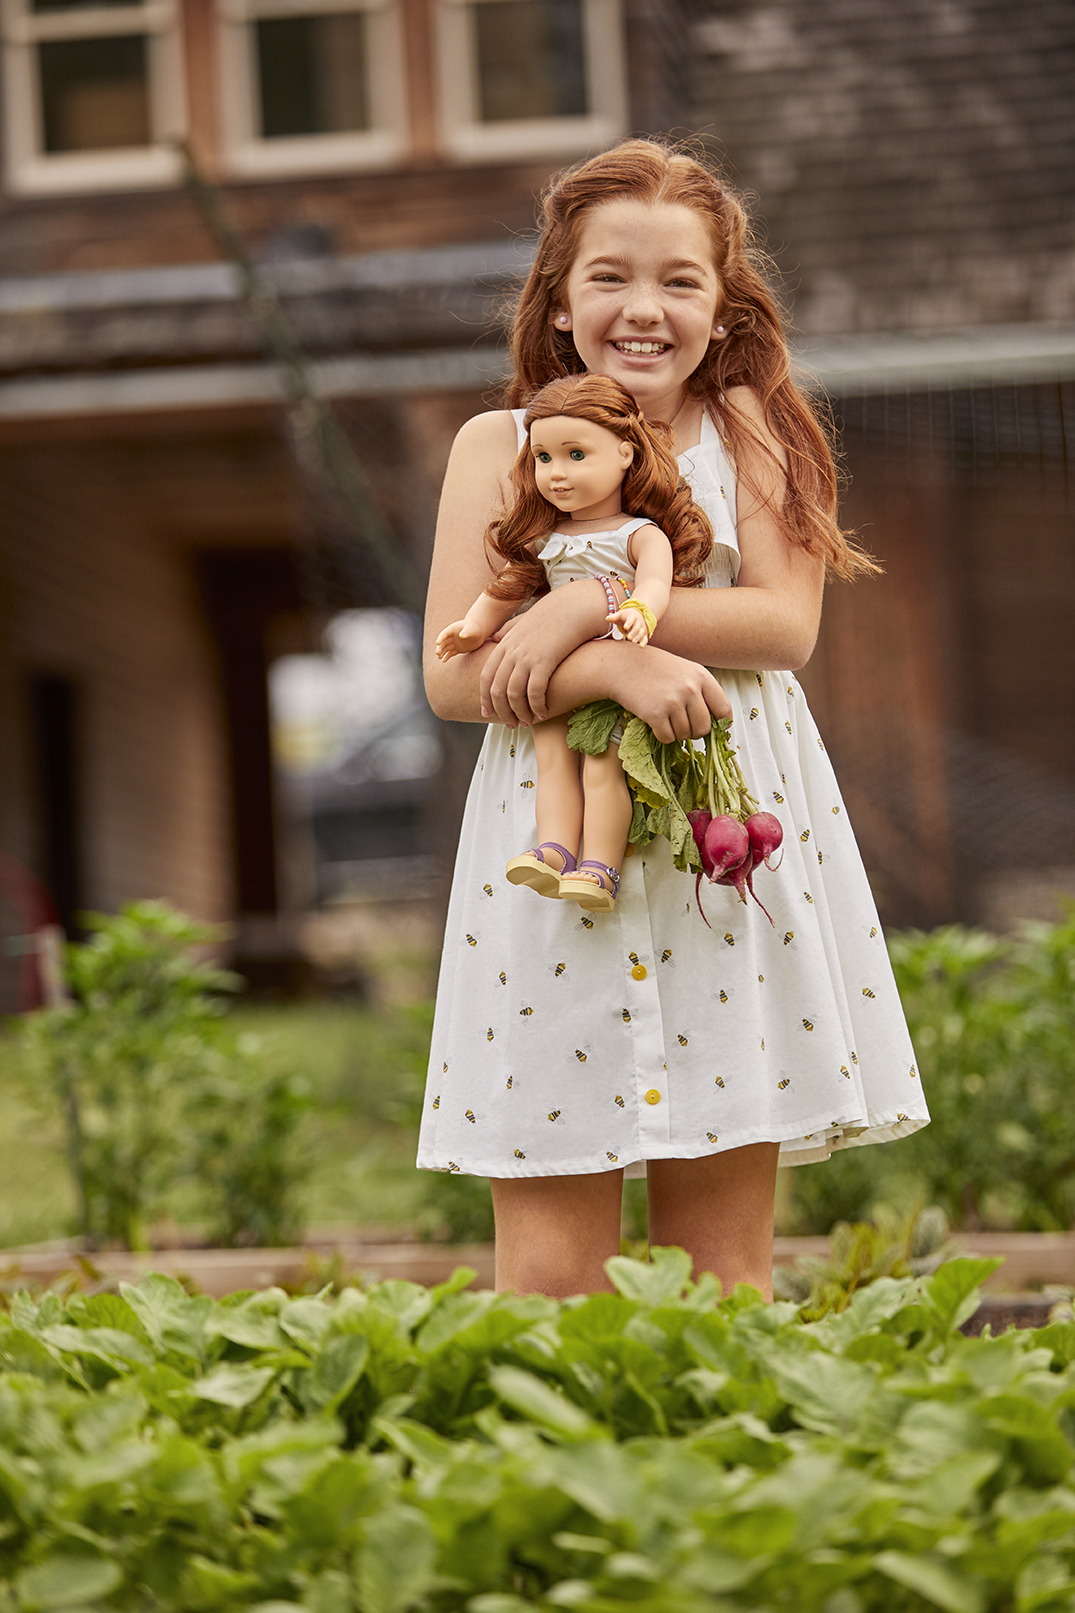 Meet Blaire Wilson American Girl's 2019 Girl of the Year